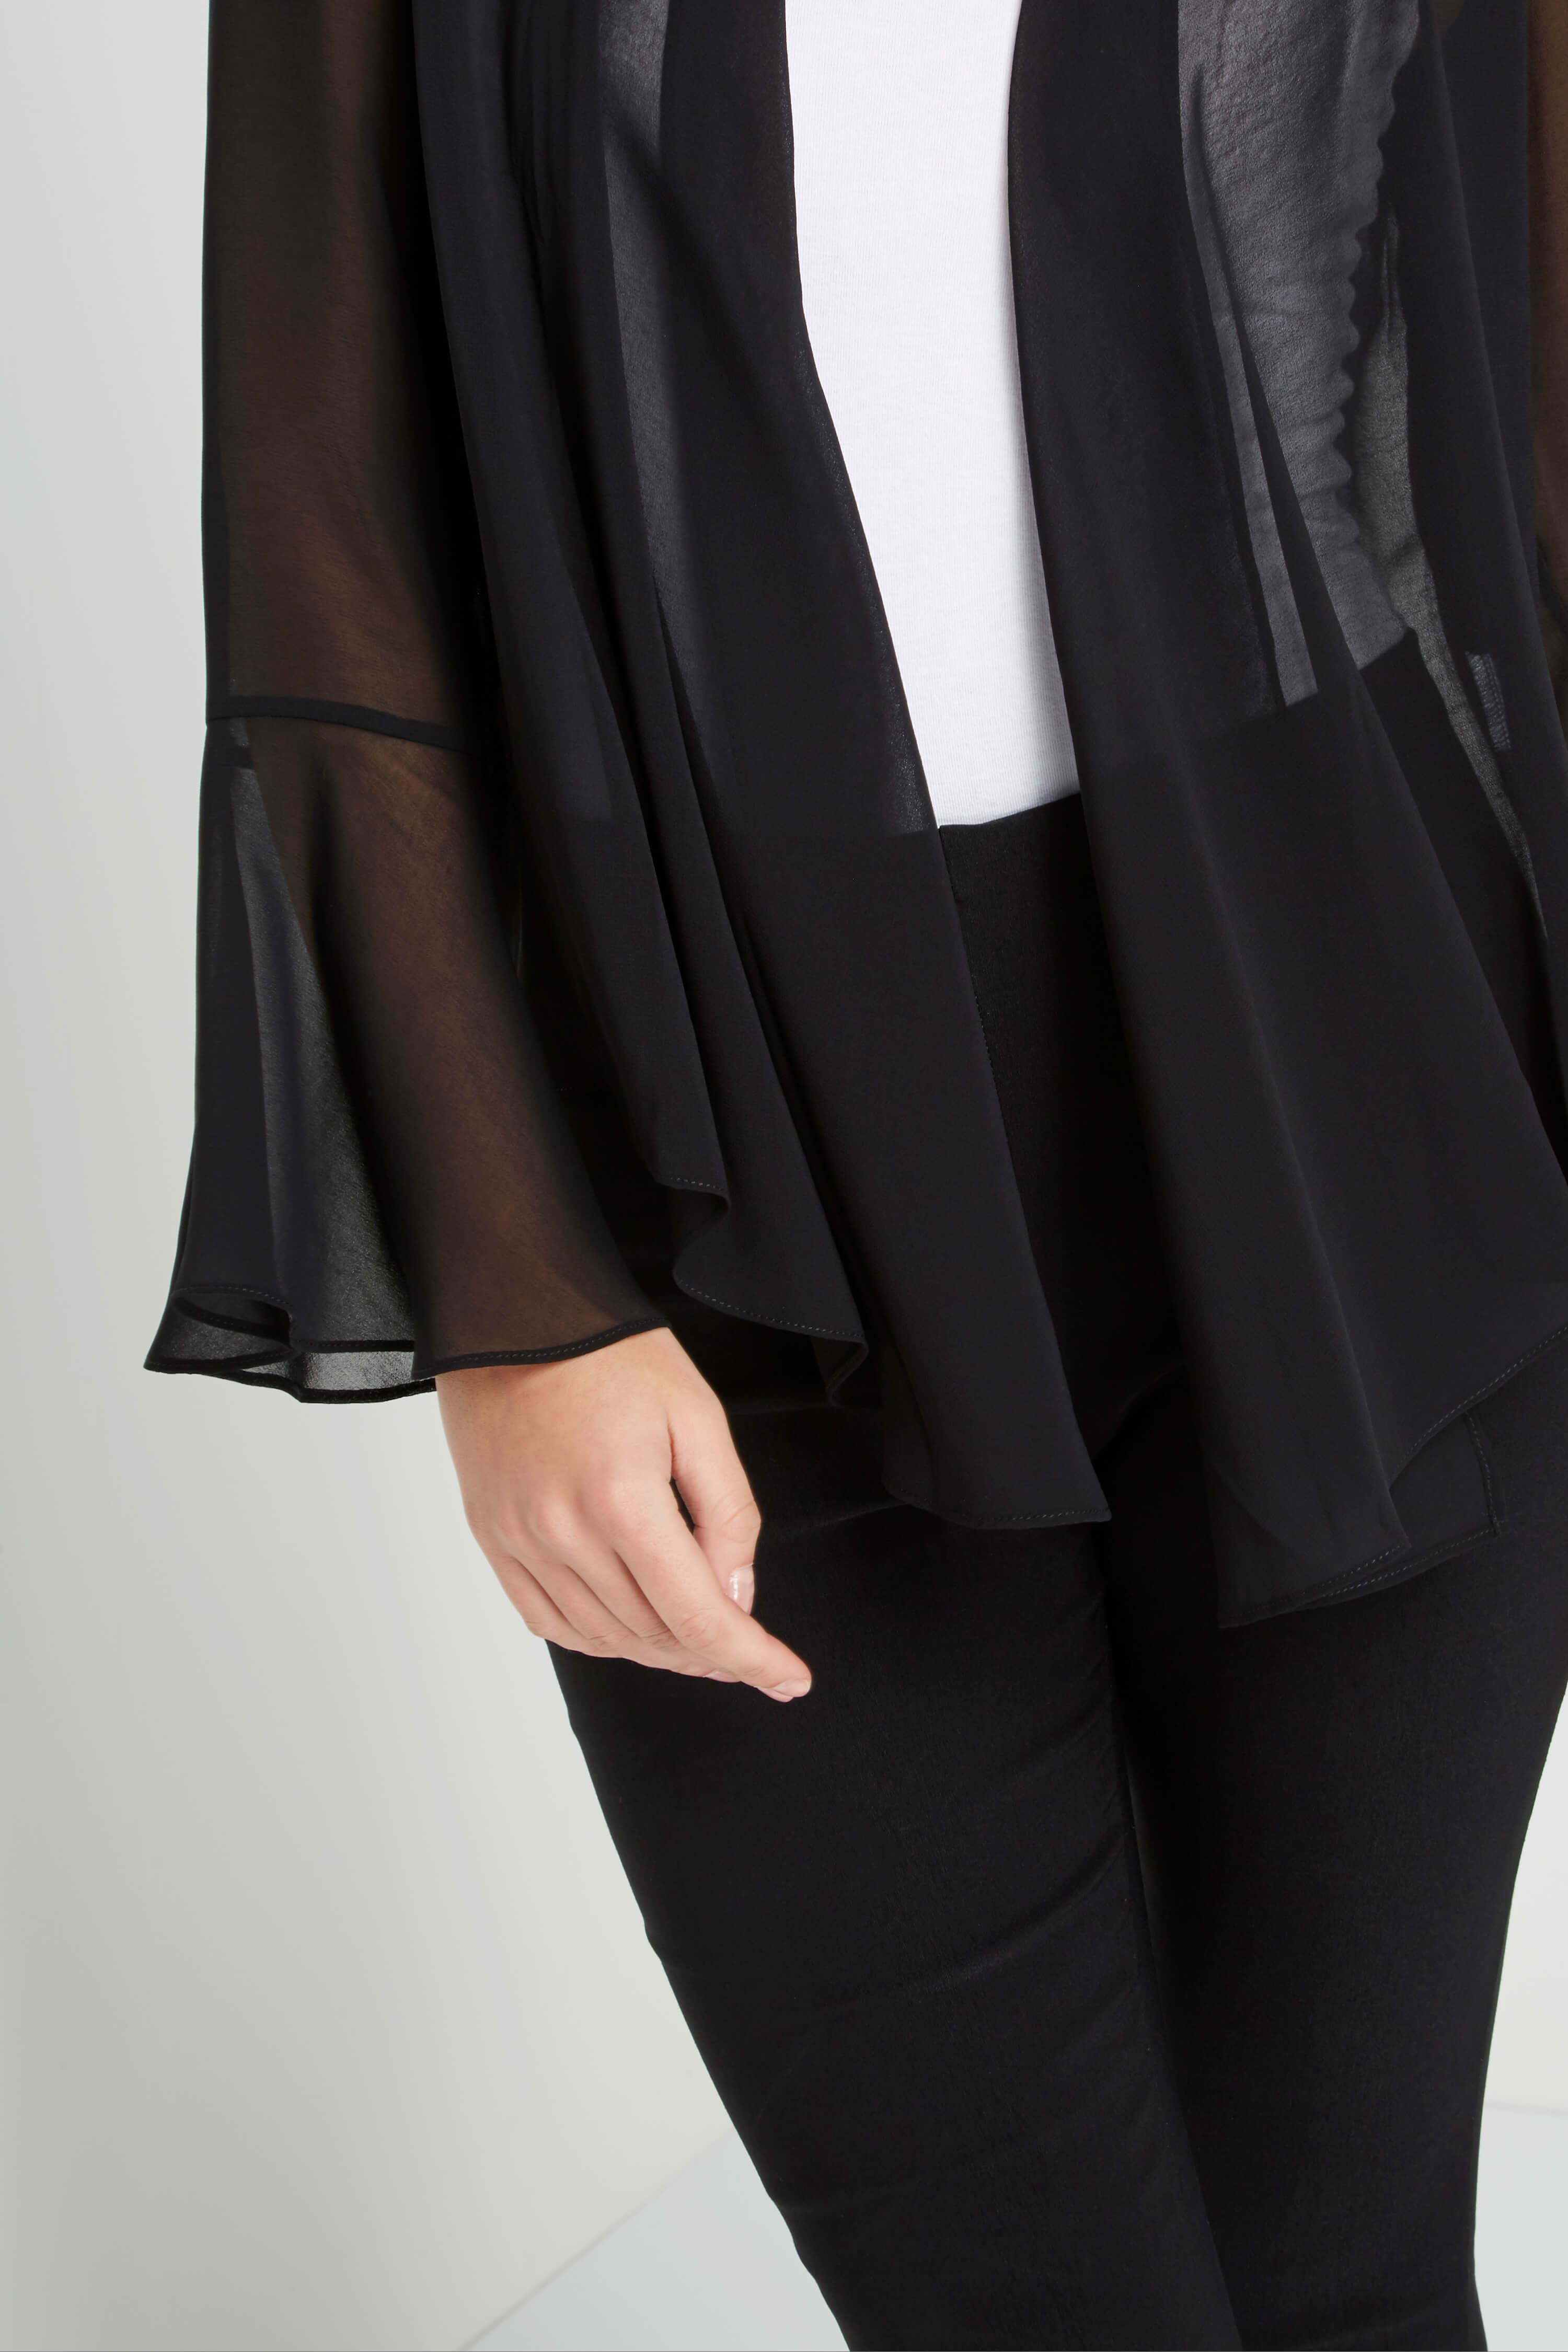 Roman-Originals-Women-039-s-Black-Sheer-Chiffon-Jacket-Sizes-10-20 thumbnail 14